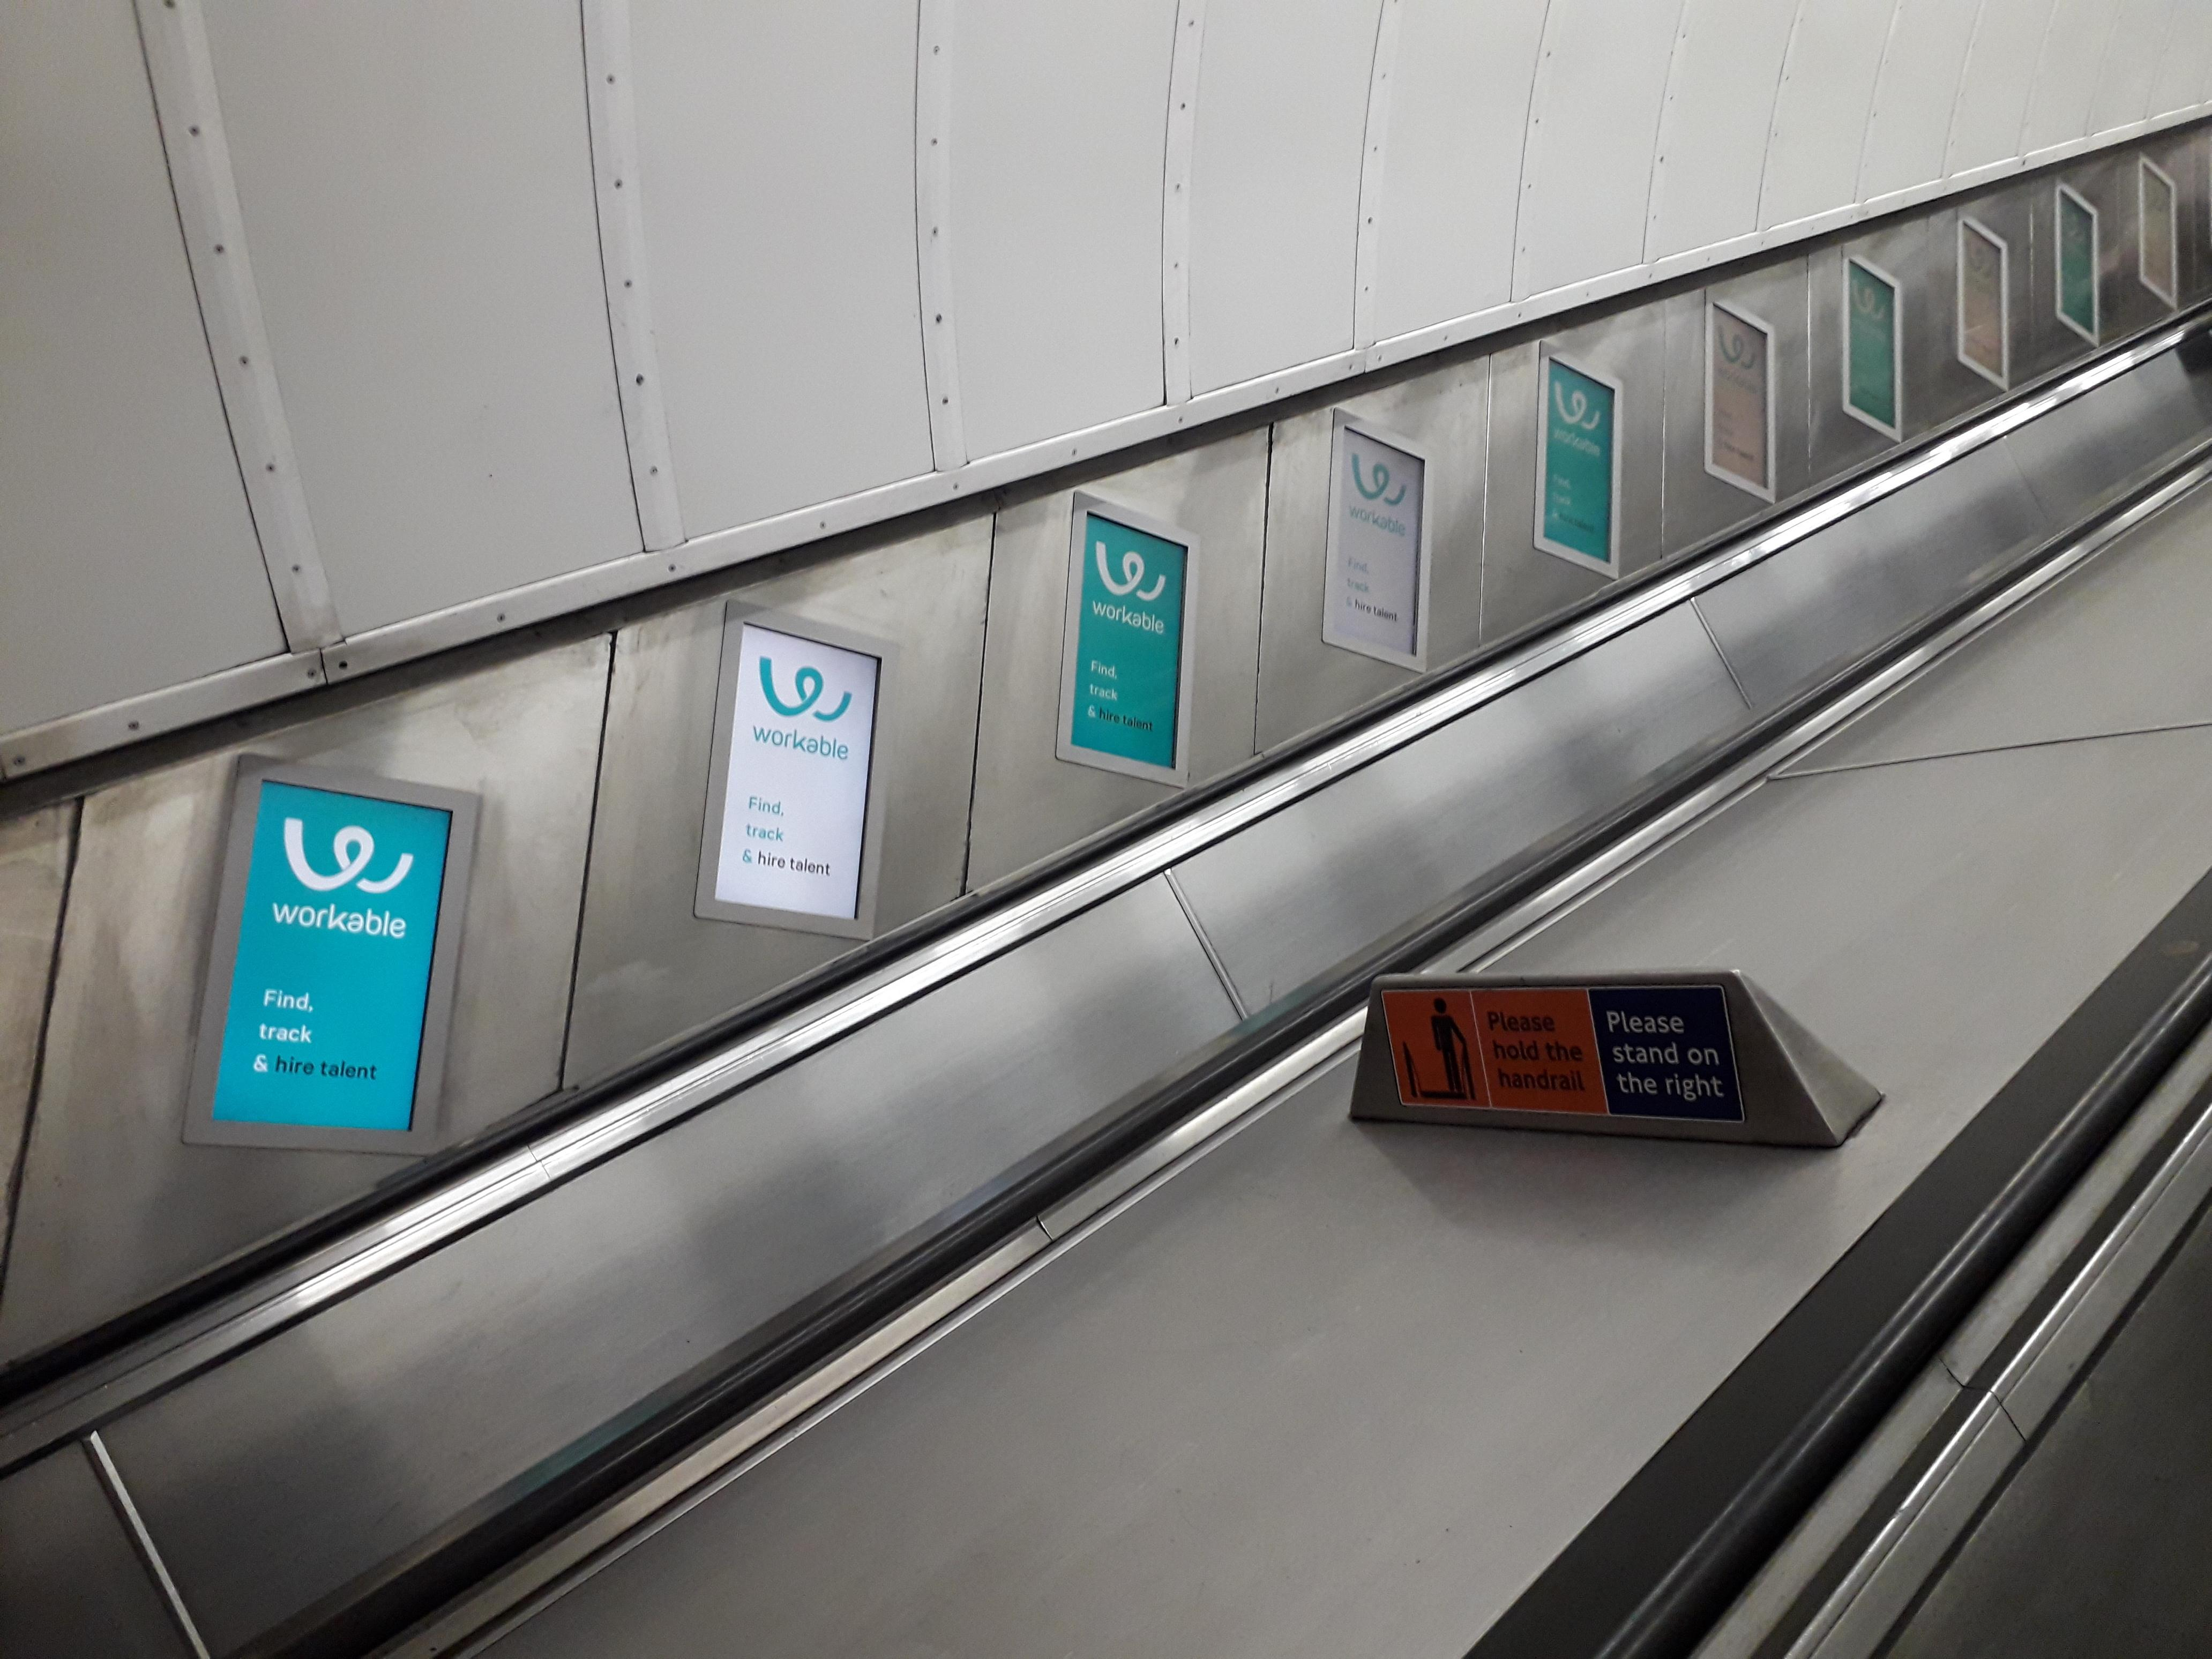 London Tube Advertising